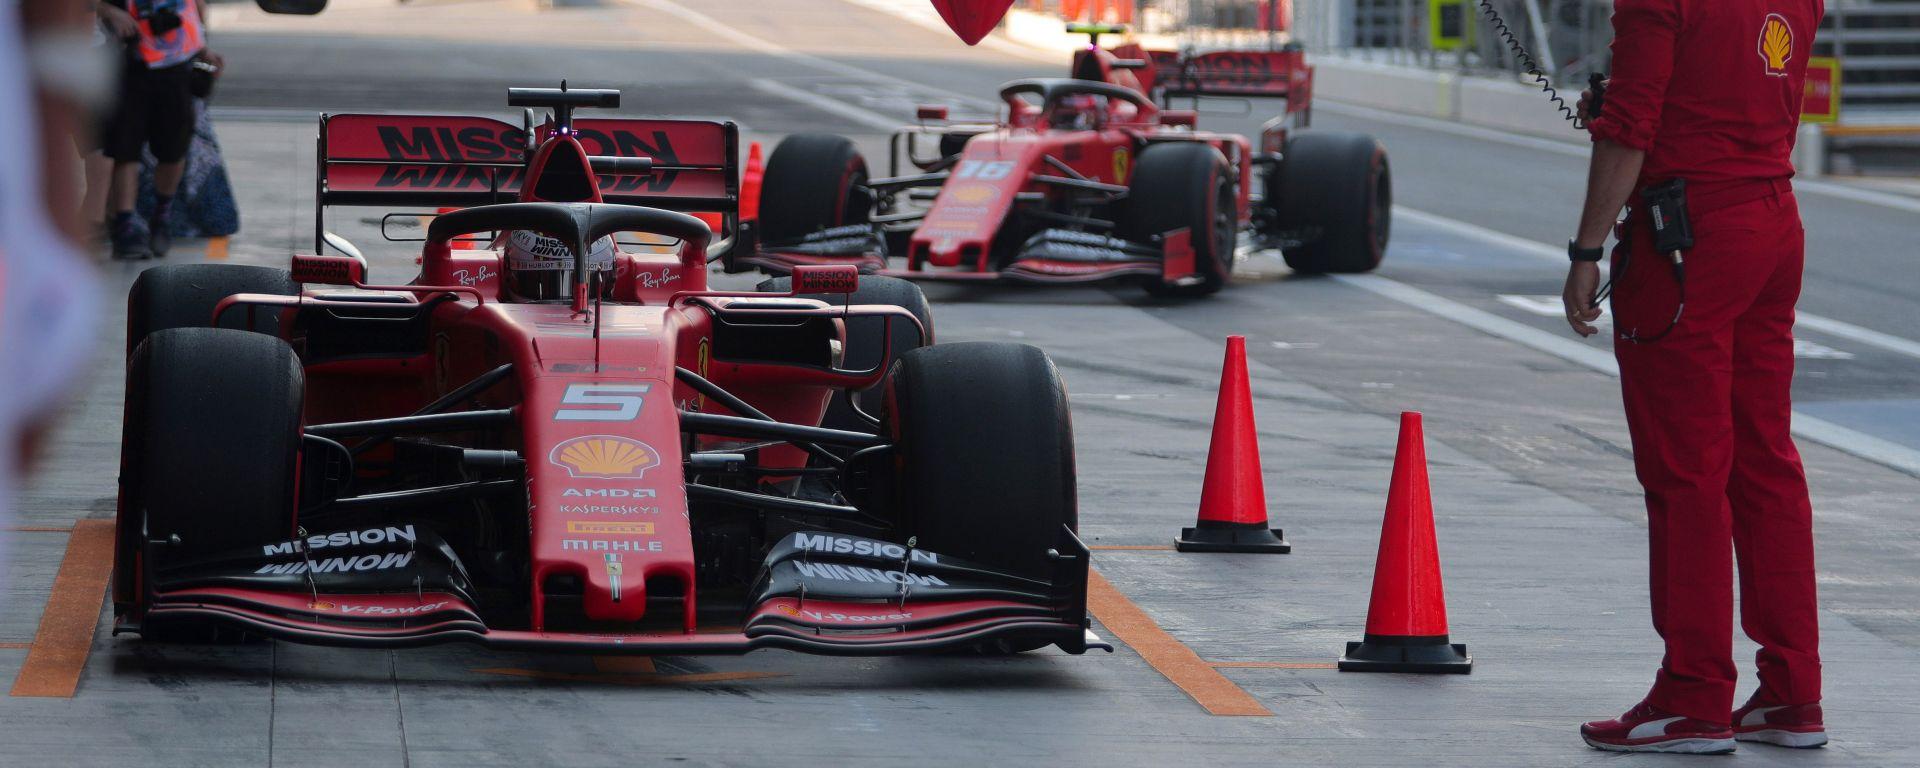 F1 GP Abu Dhabi 2019, Yas Marina: Sebastian Vettel e Charles Leclerc (Ferrari)